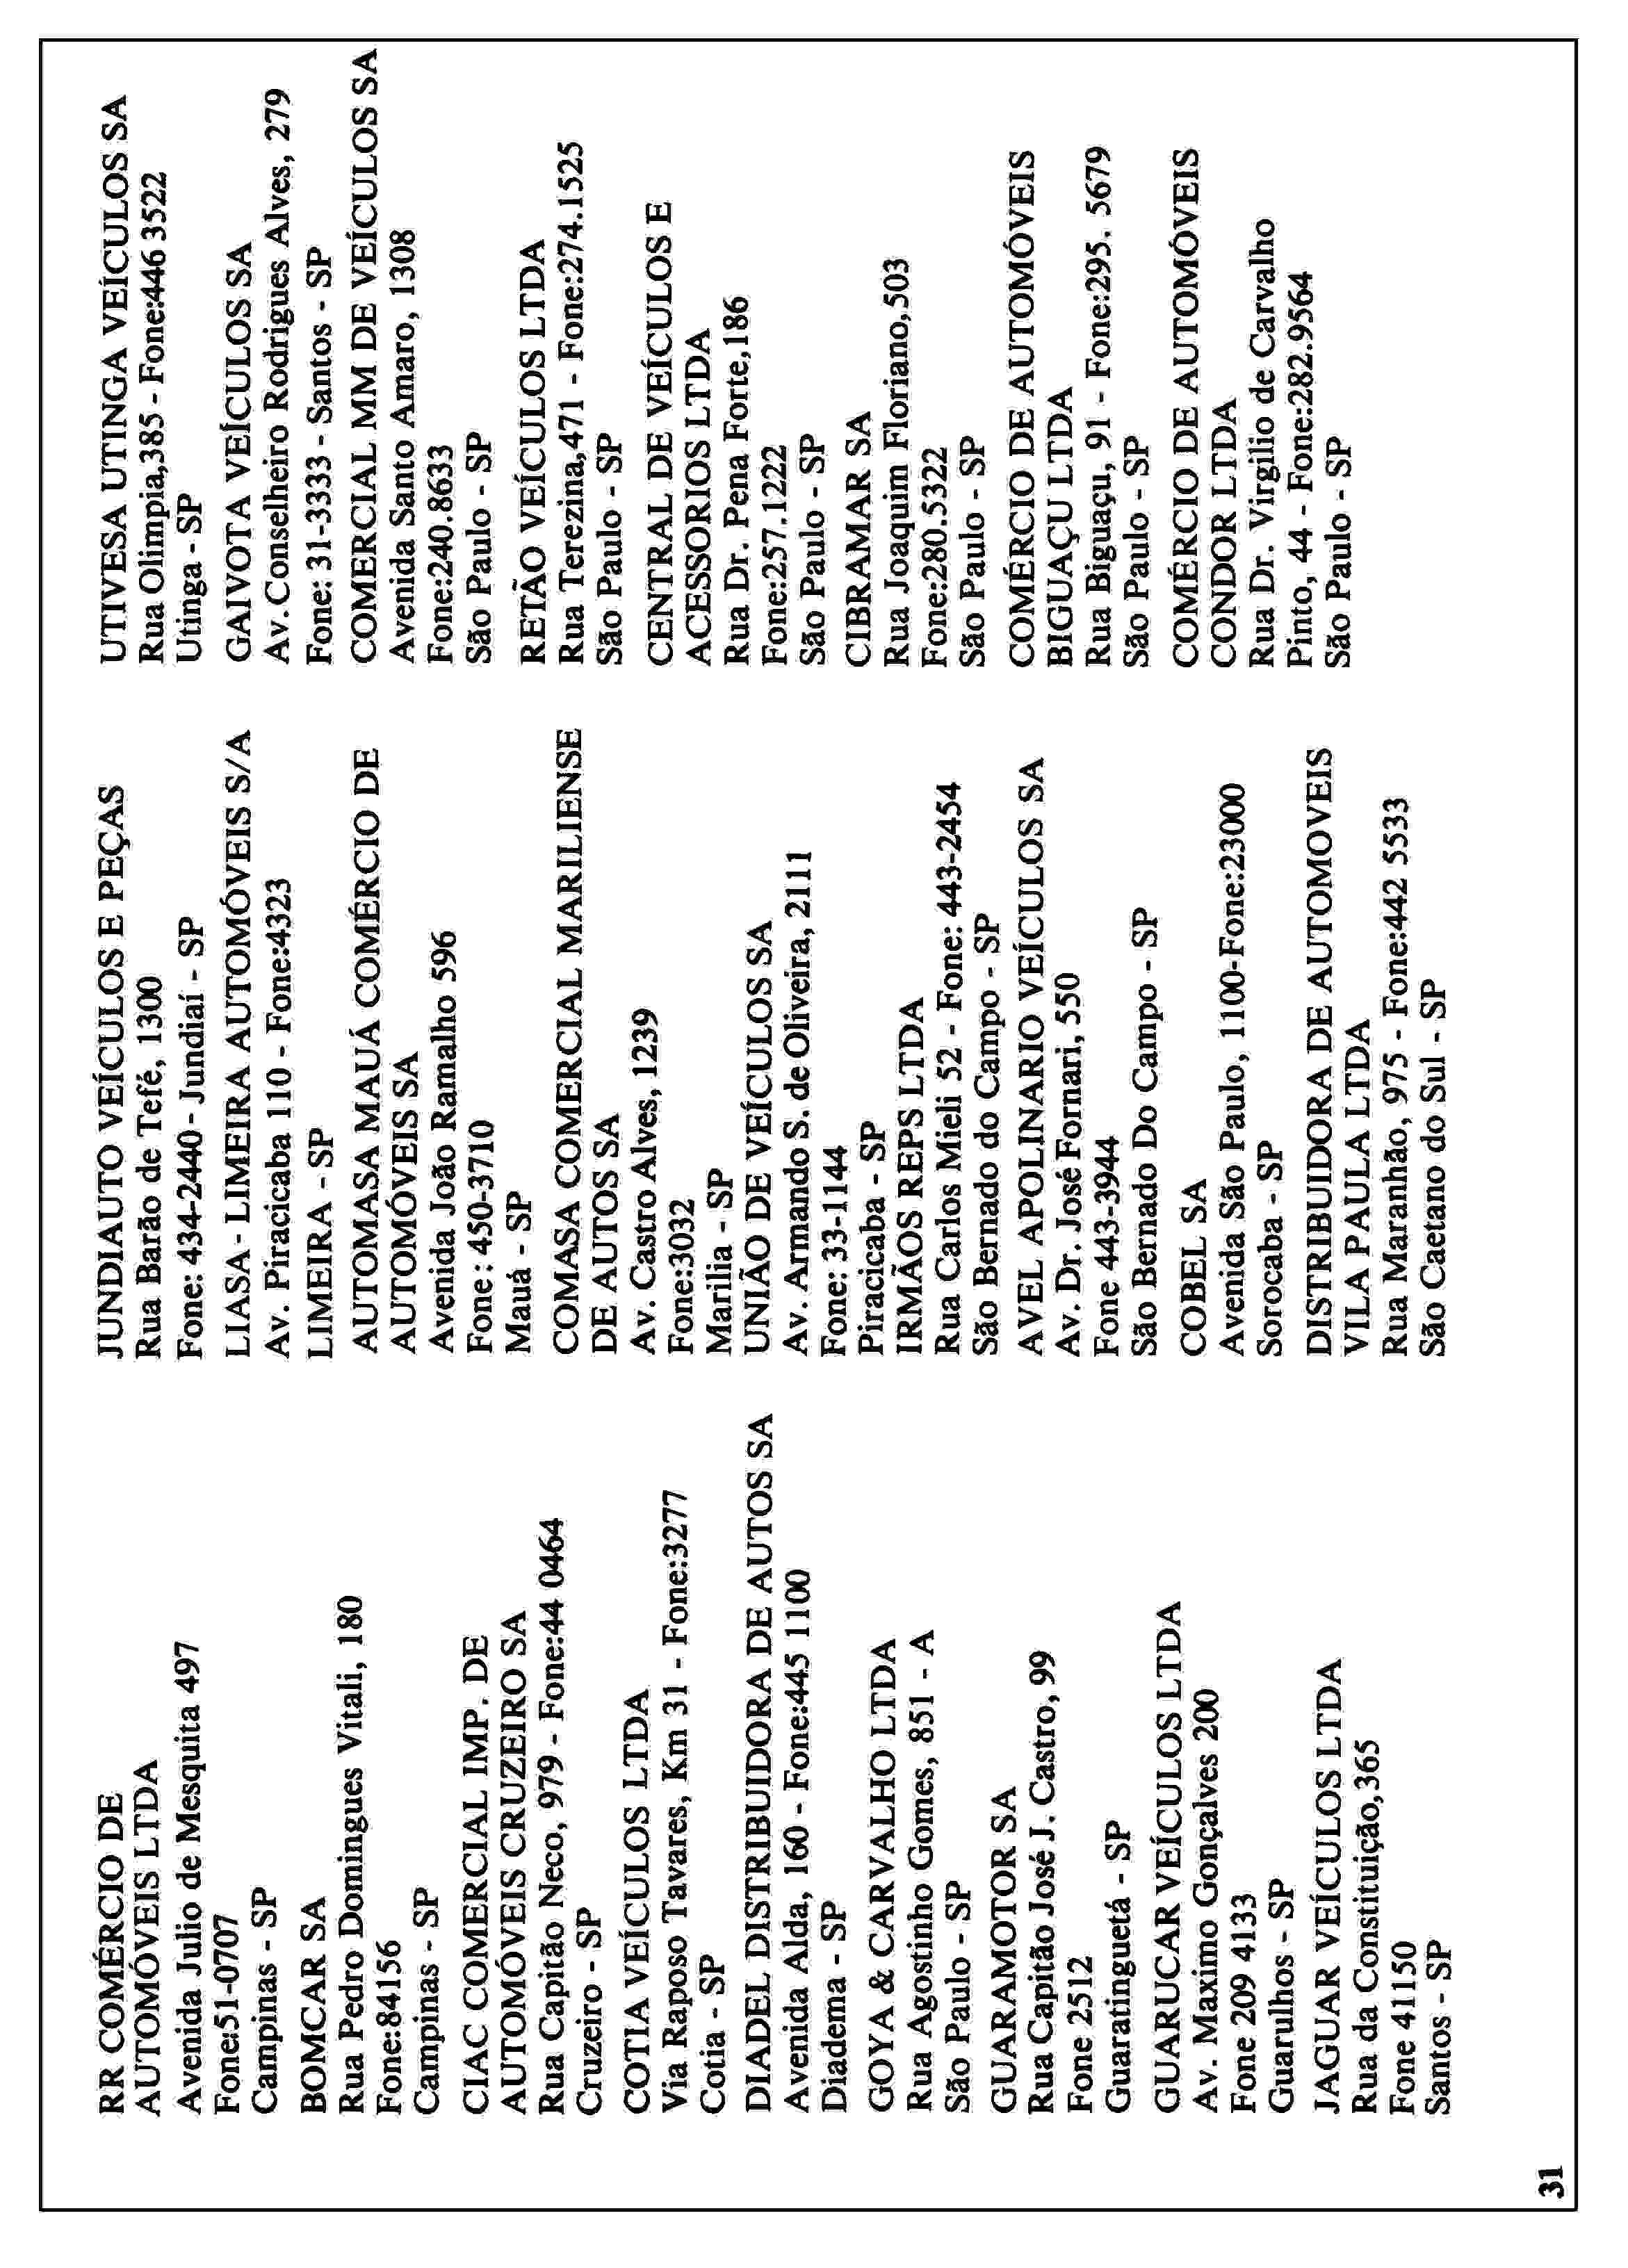 wouter u0026 39 s page   puma owner u0026 39 s manual